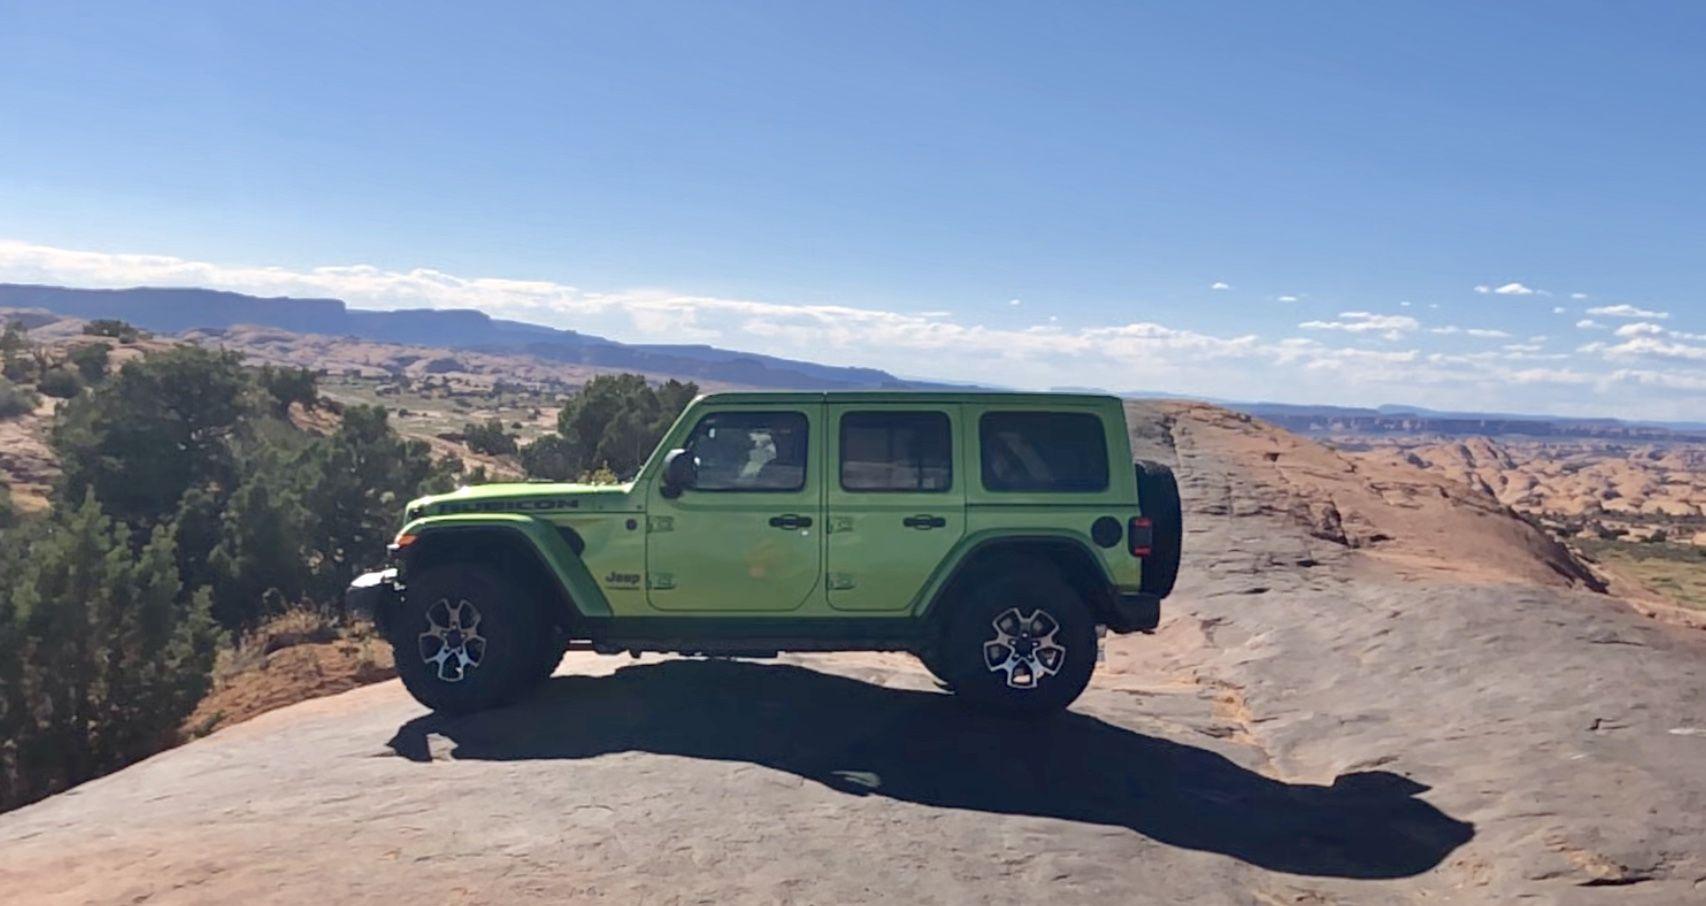 Fins And Things Trail Moab Utah July 2019 Rdoff Road Jeep Jeepjl Wrangler Jeepwrangler Wranglerjlu Jeepwranglerjlu Jeepw With Images Jeep Jl Wrangler Jl Offroad